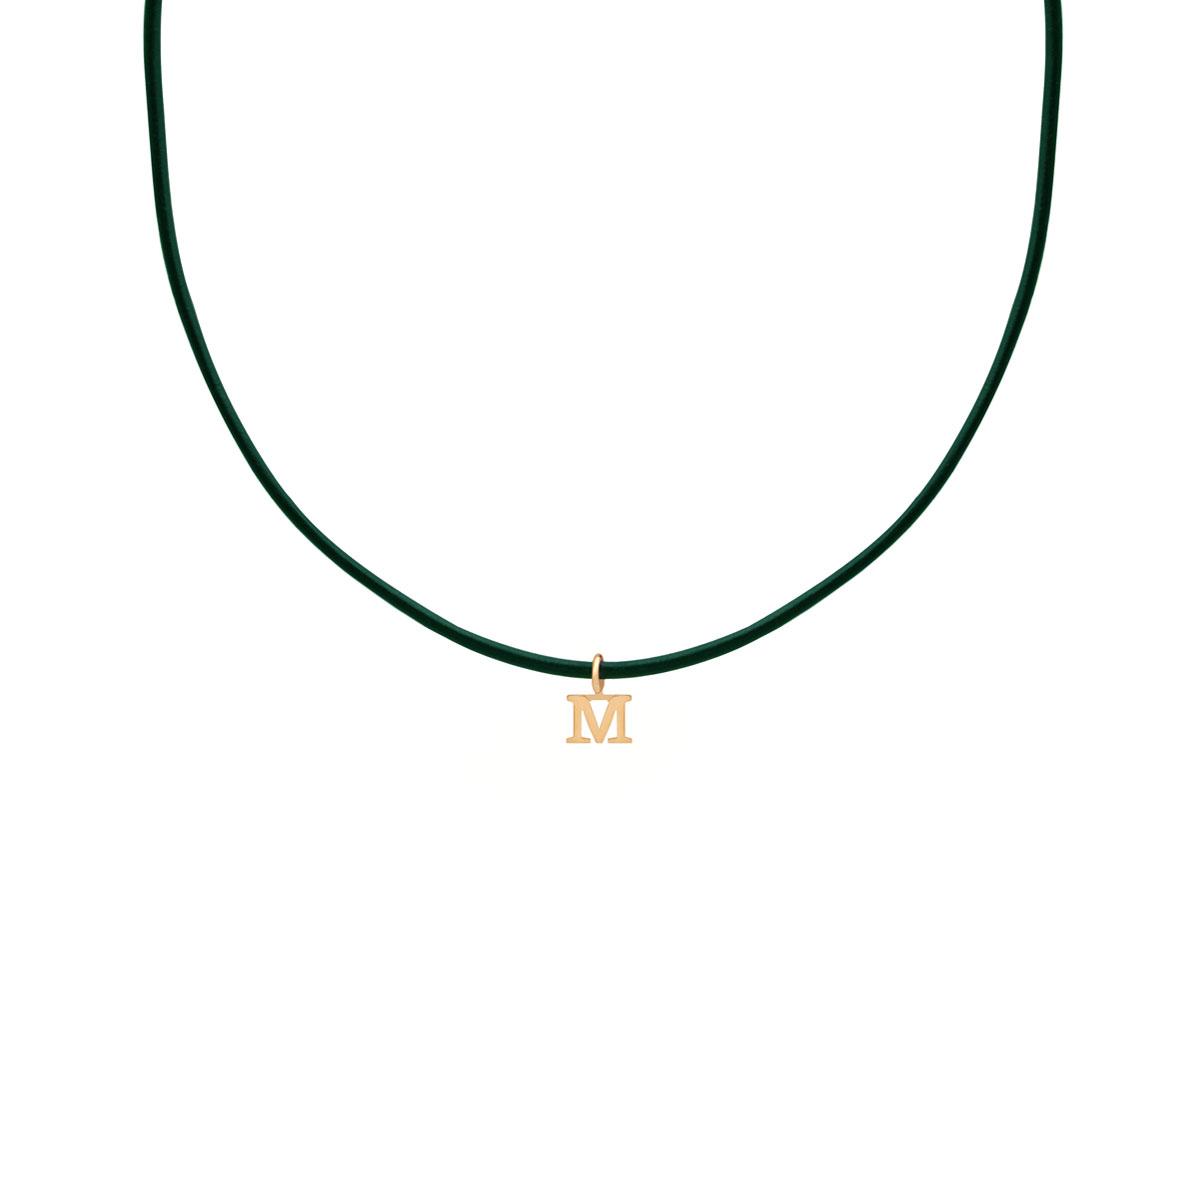 پرسته گردنبند طلا M